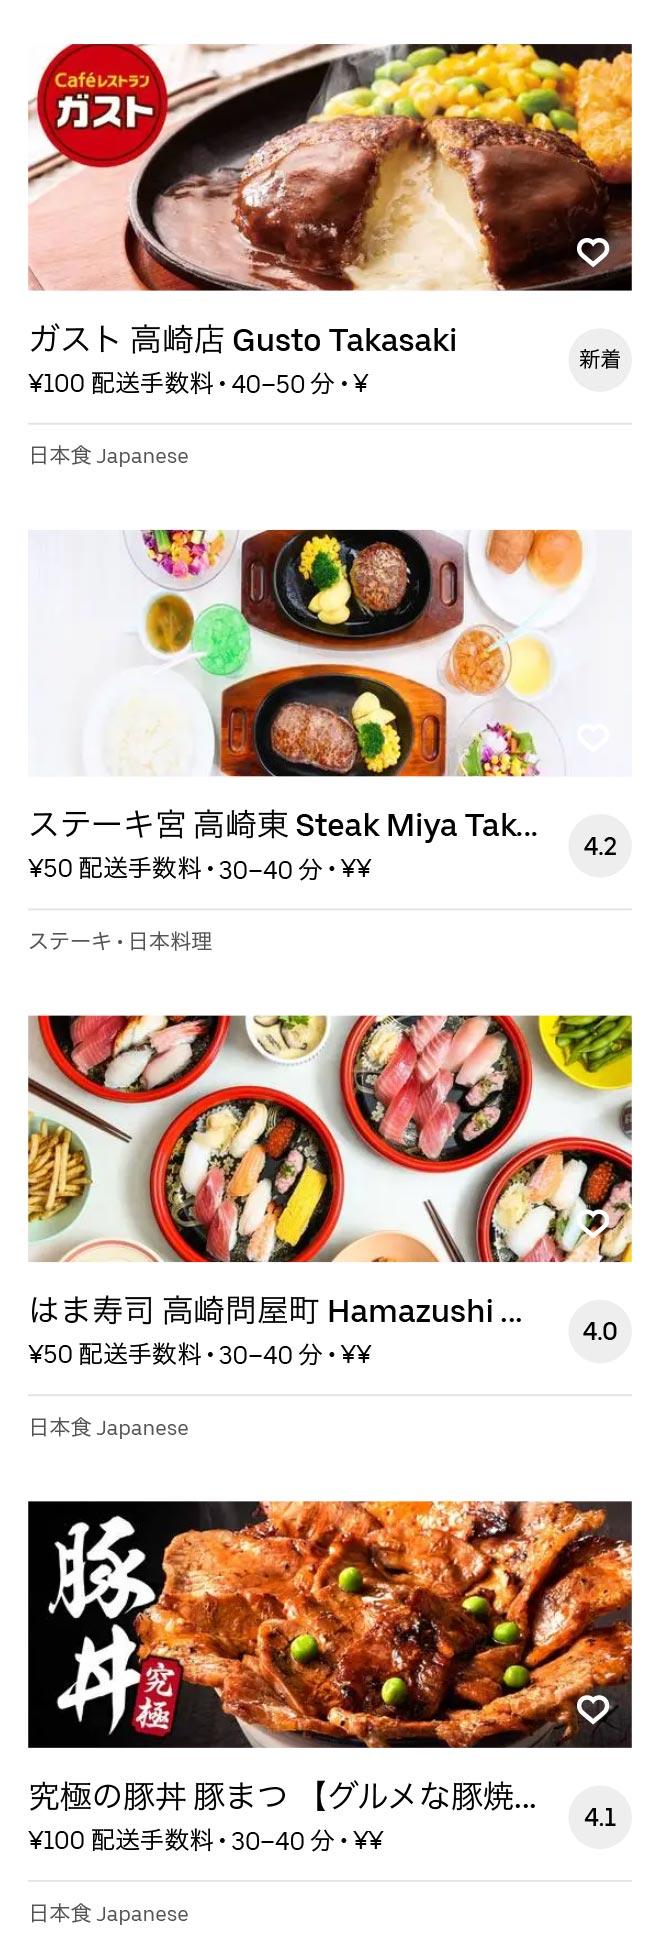 Tonyamachi menu 2010 07